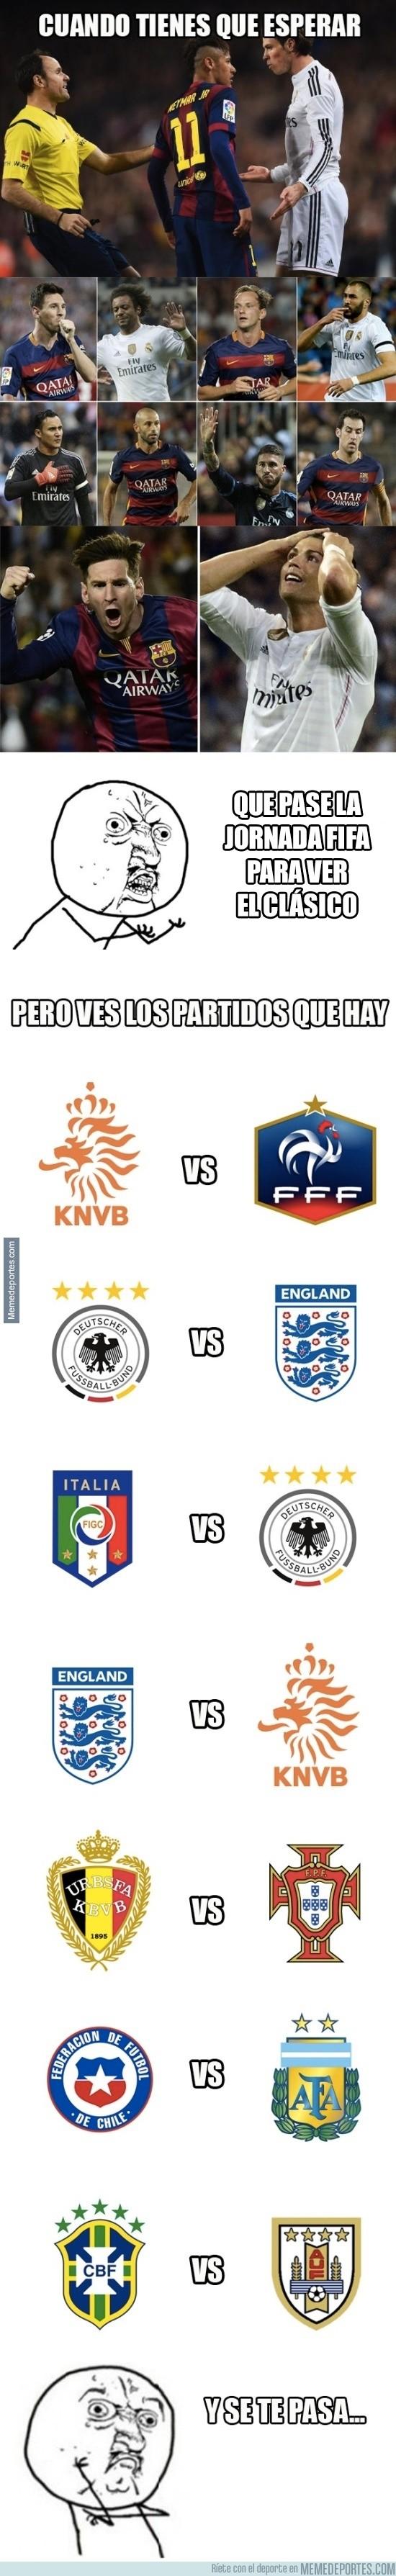 825341 - ¡Partidazos esta jornada FIFA!